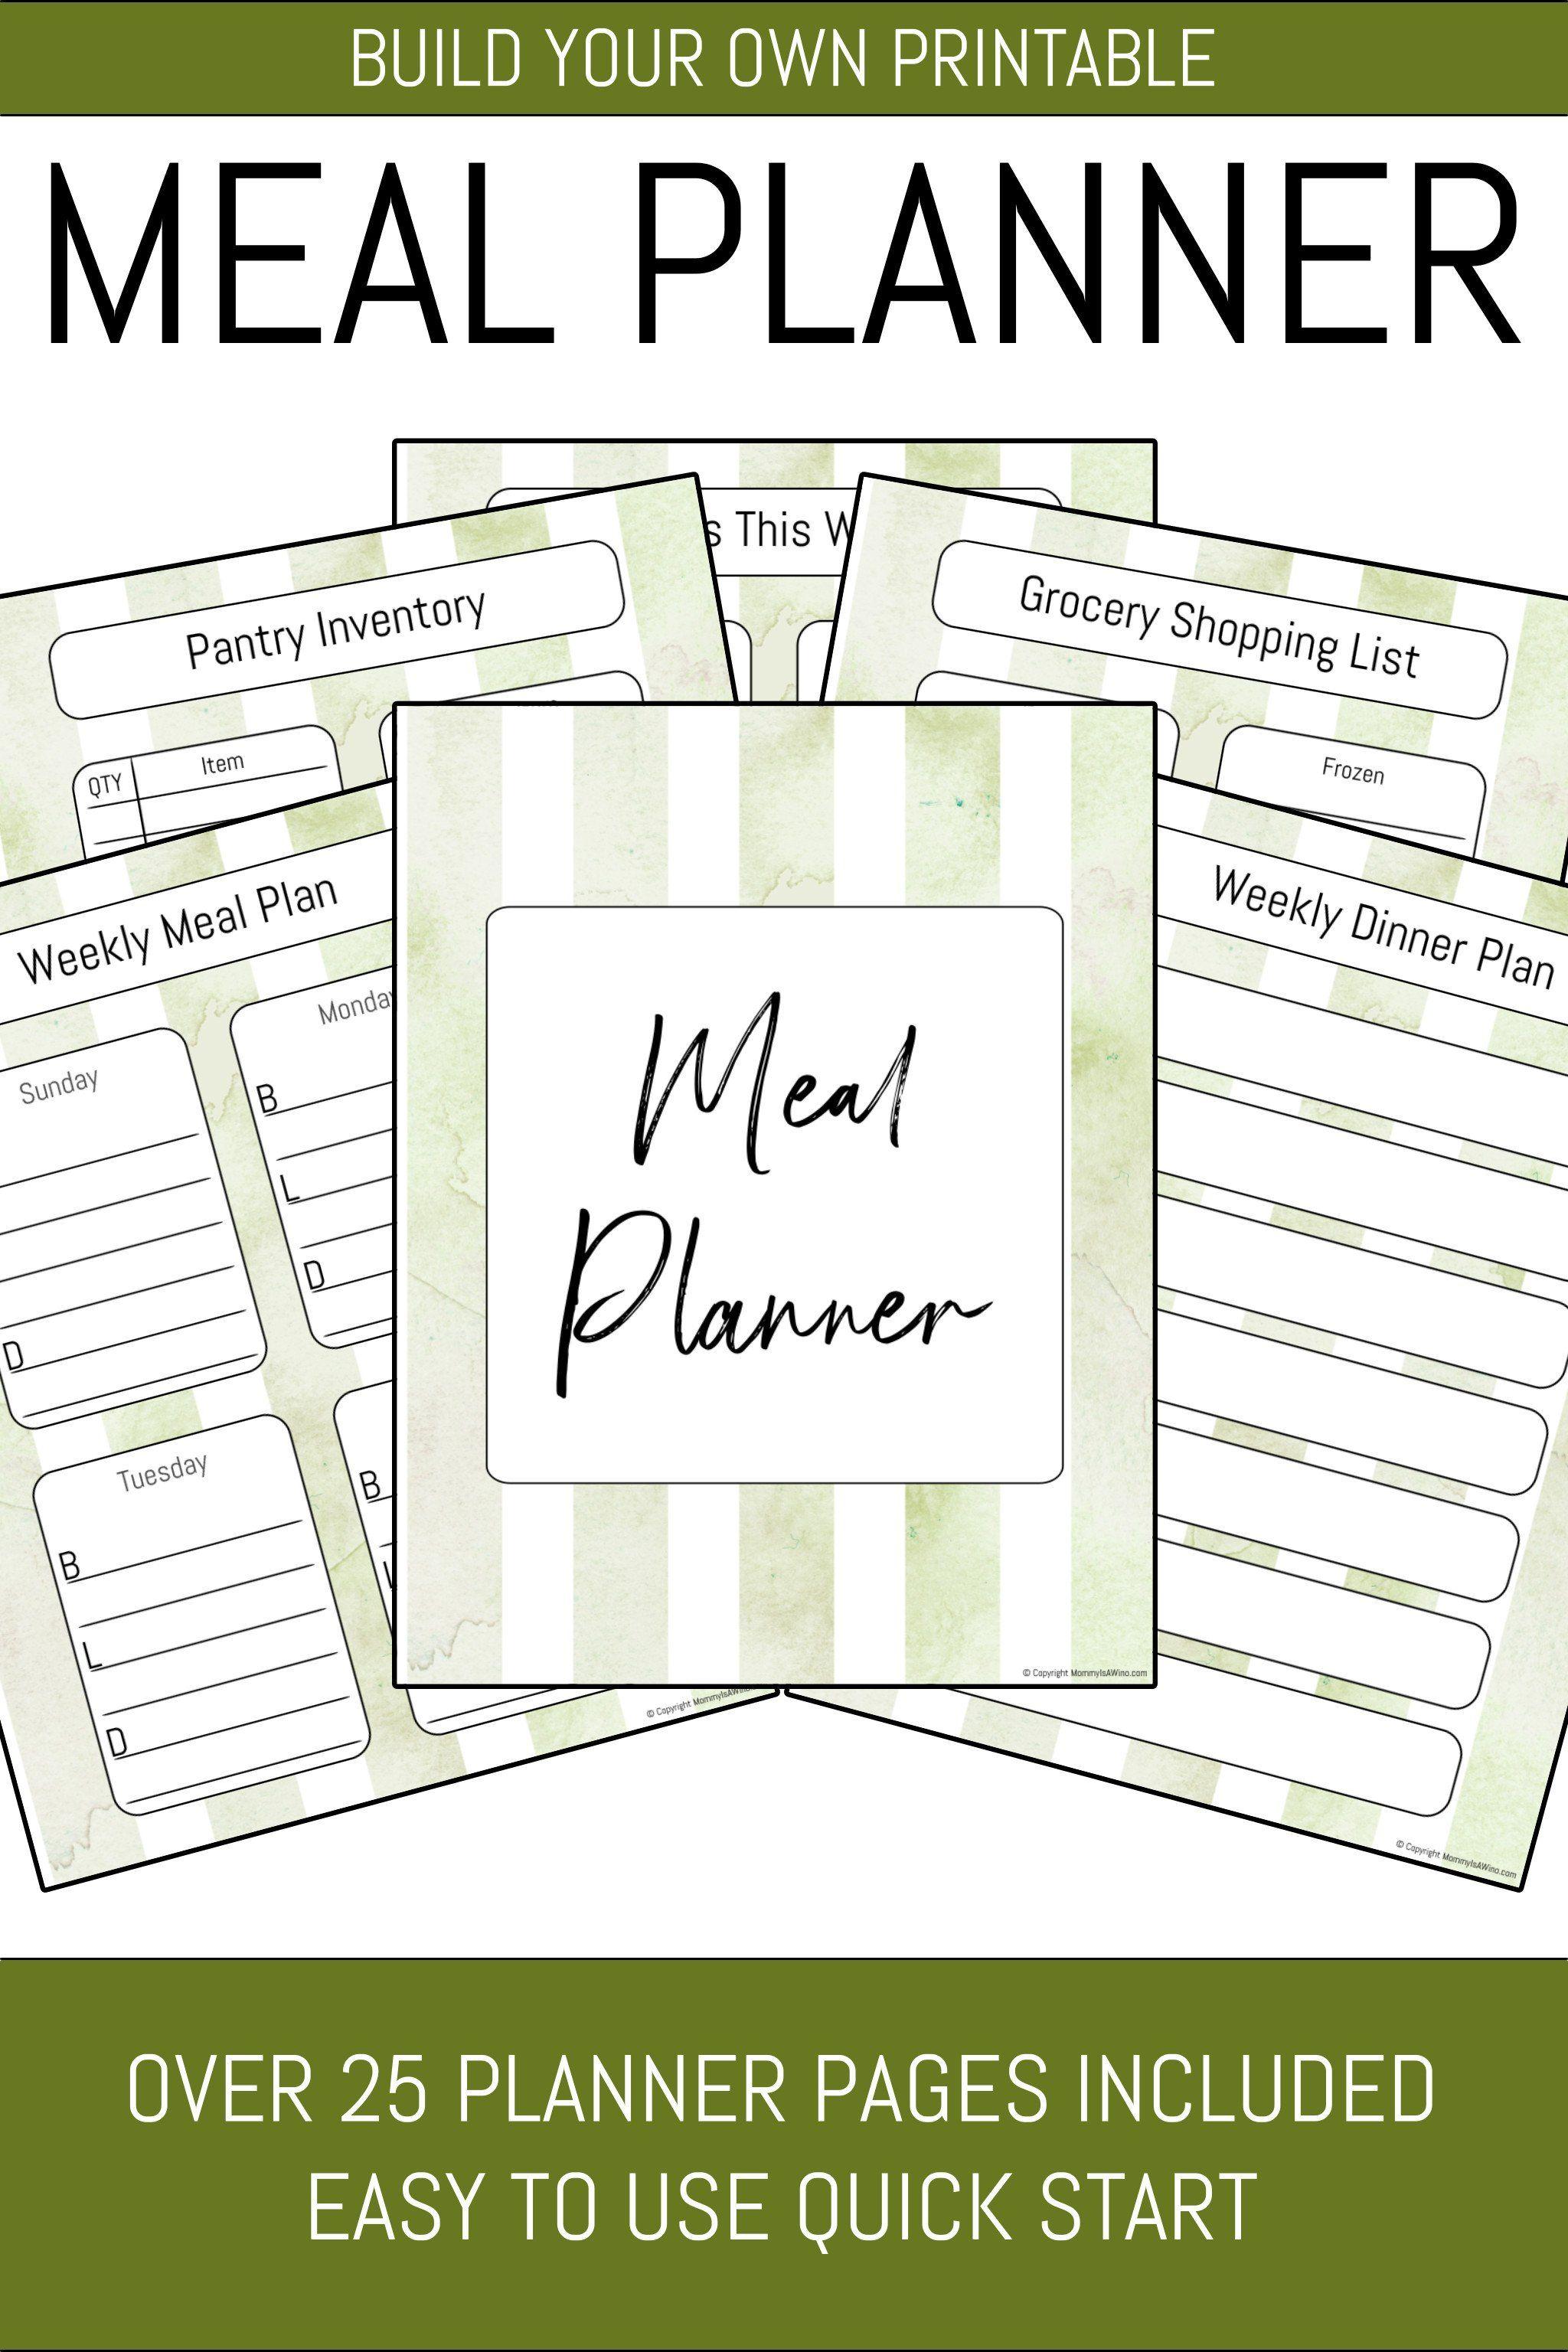 Meal Planner Binder 29 Pages